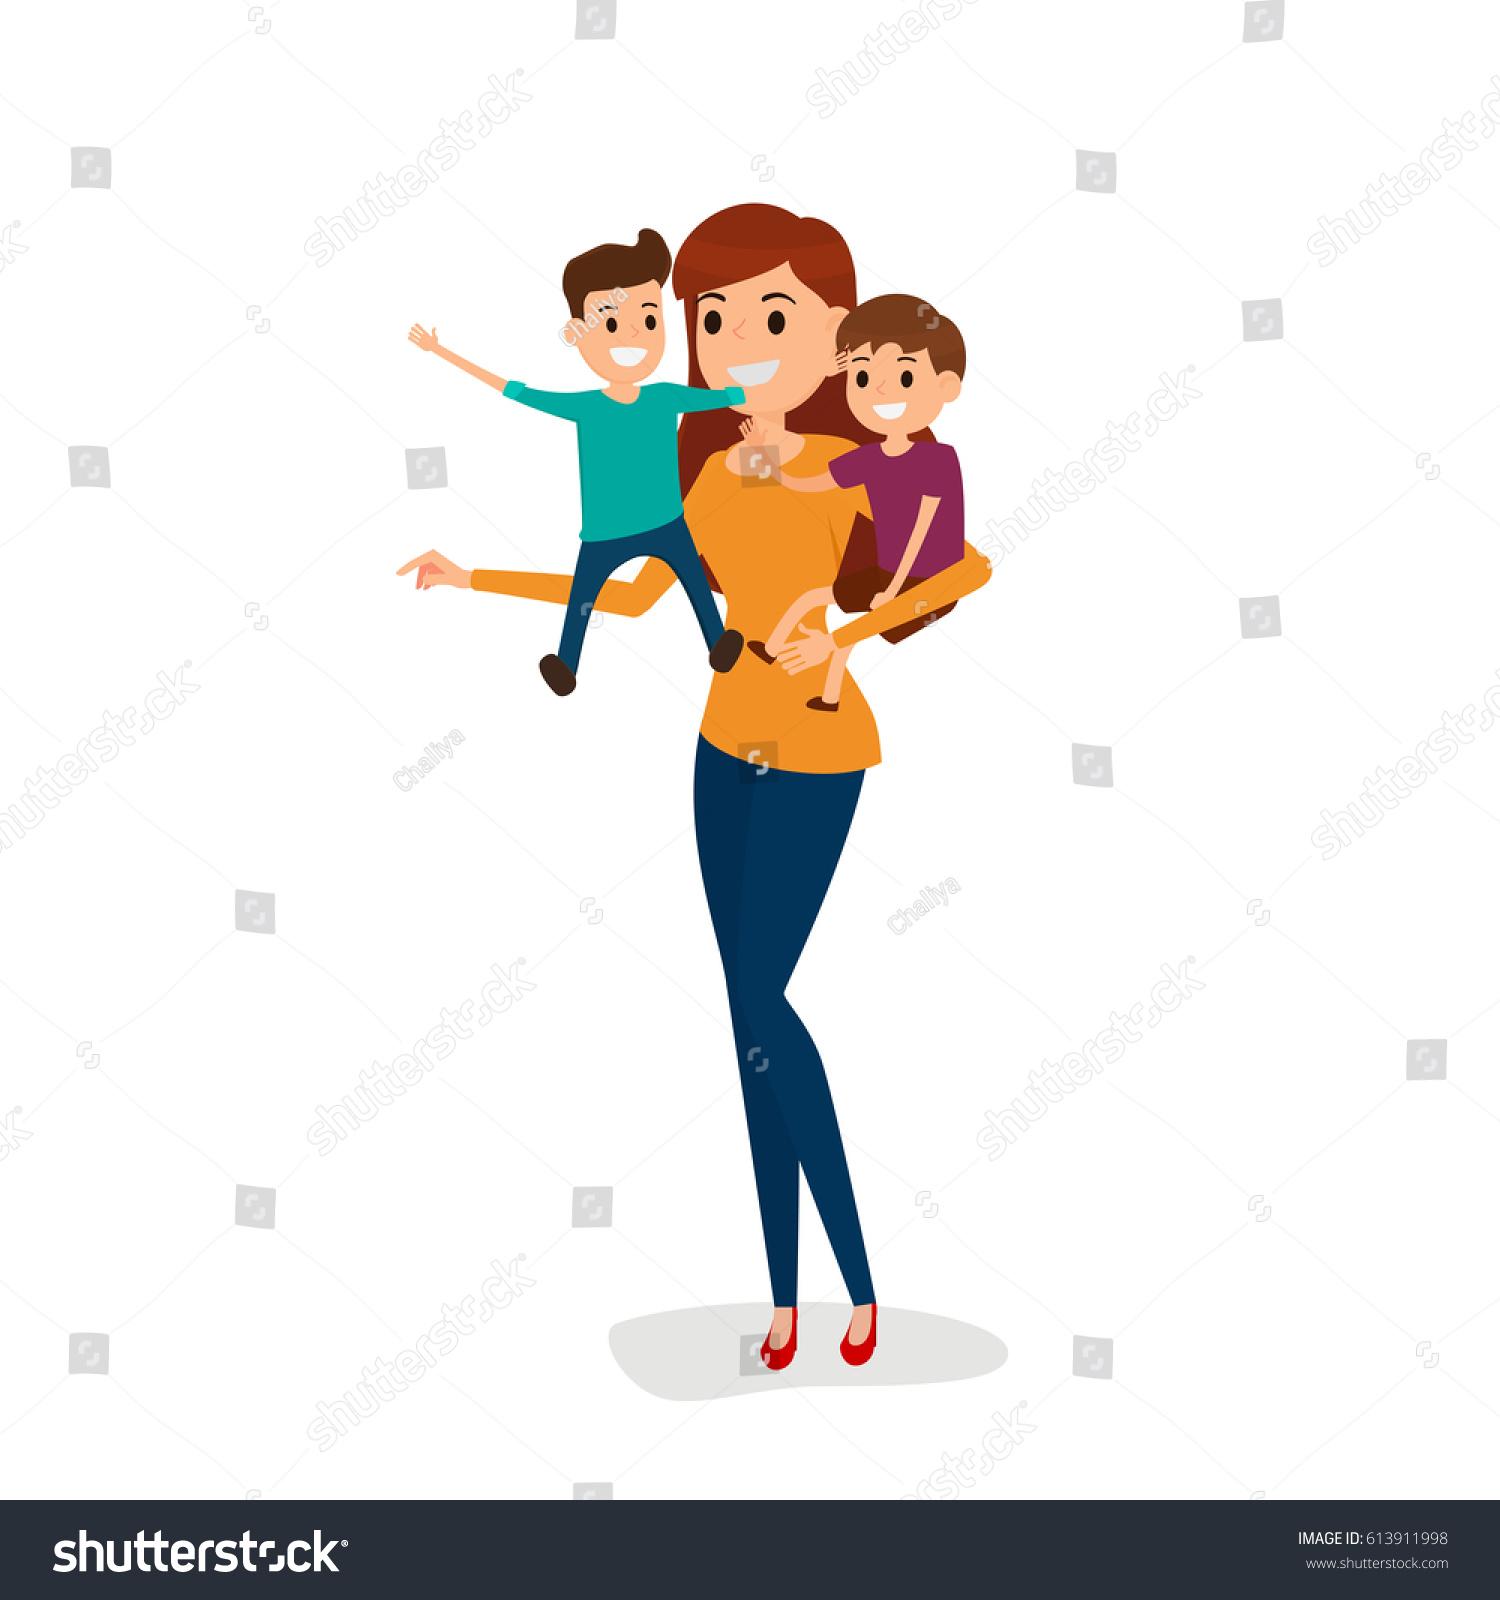 Happy Family Mother 2 Son Happy Stock Vector Royalty Free 613911998